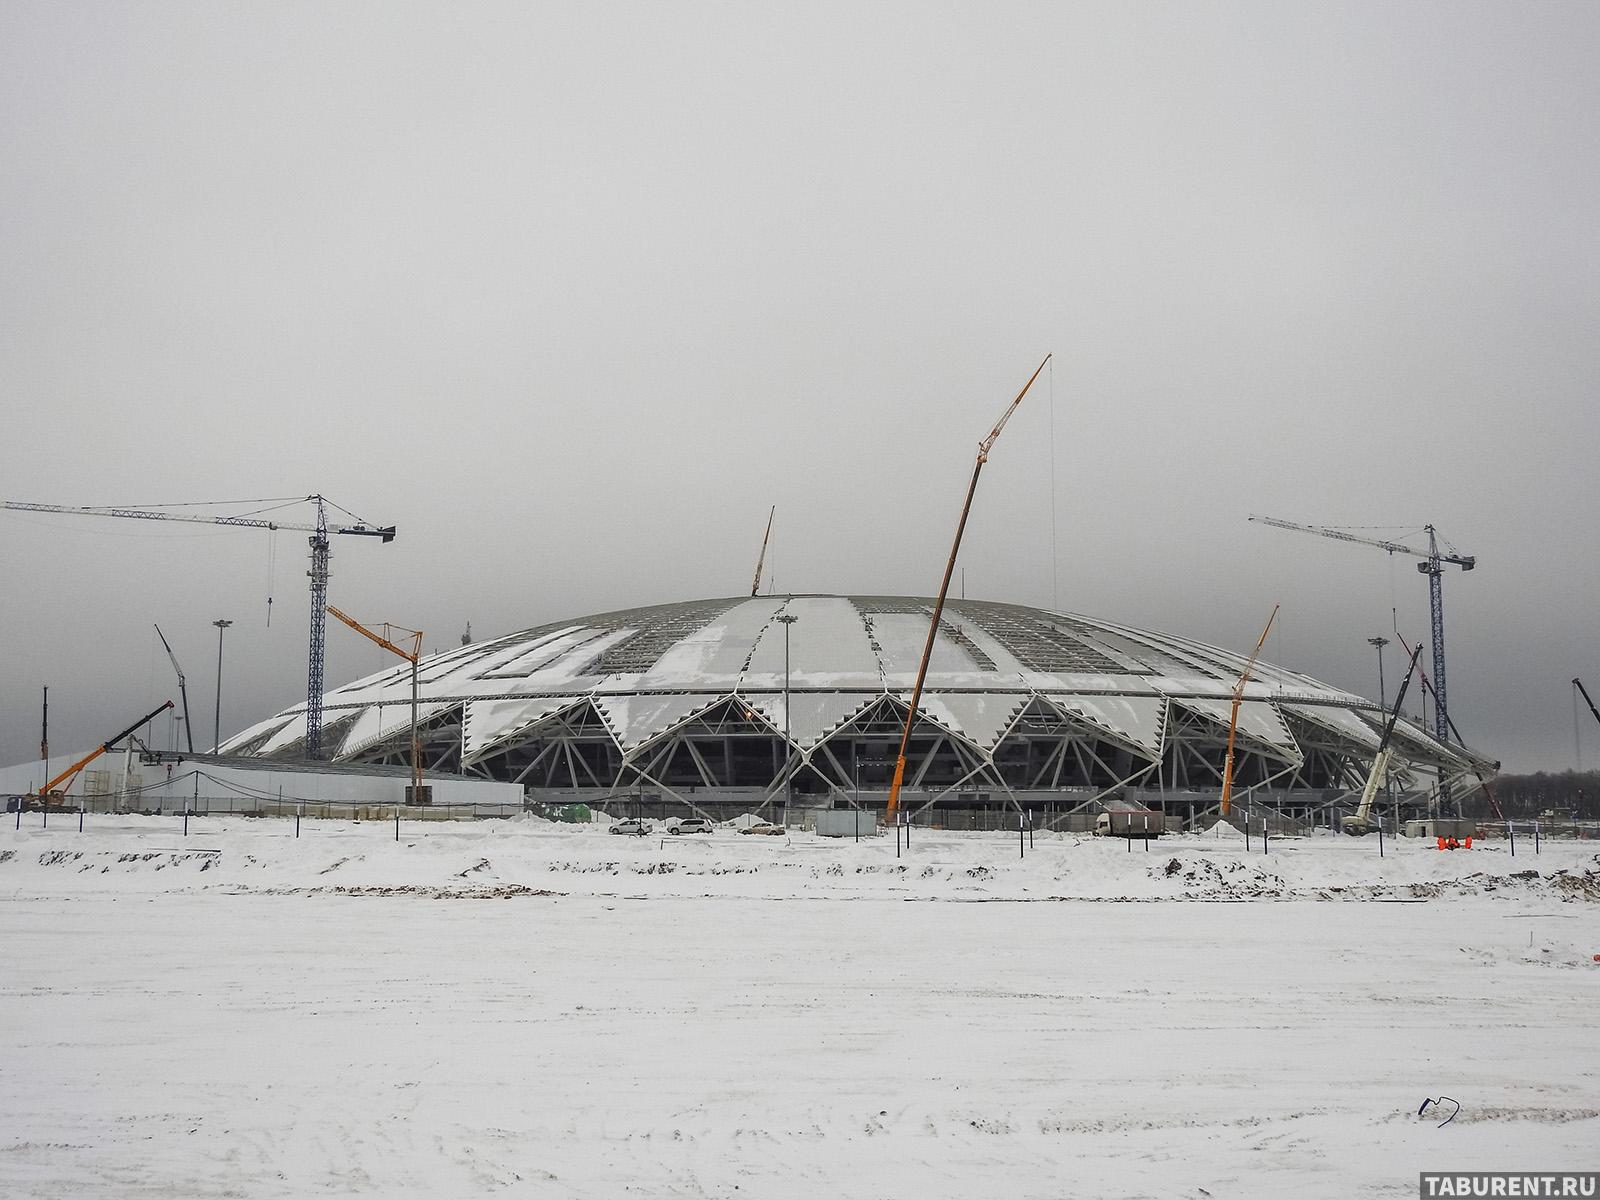 taburent.ru